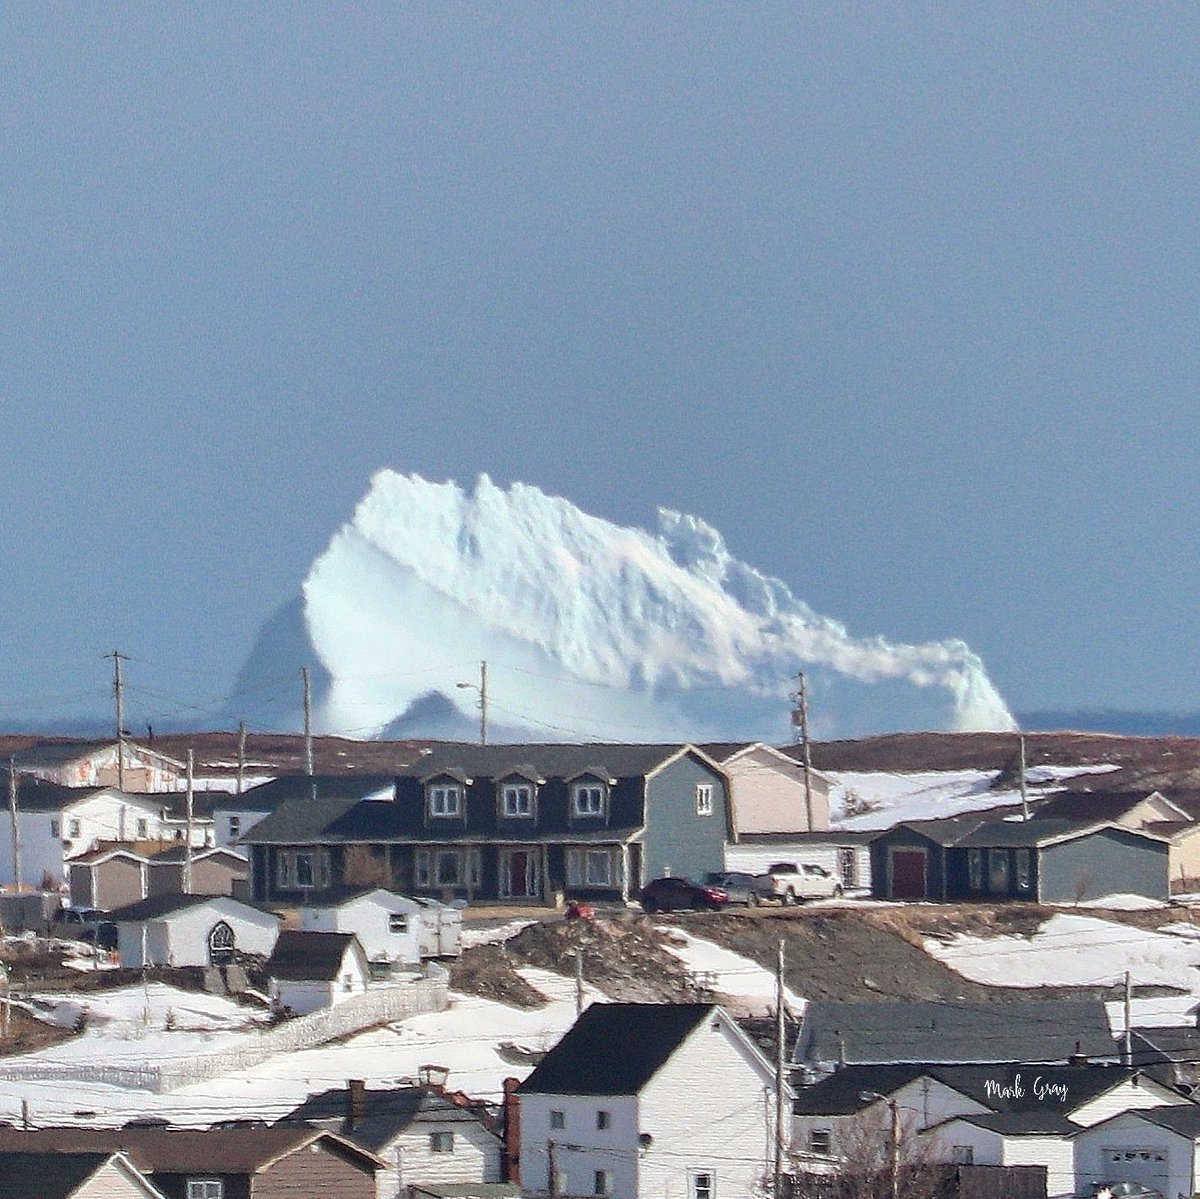 Another zoom shot of our iceberg here in Bonavista.  That house in front is my buddy's place. Perspective.  #IcebergsNL #bonavista #ShareYourWeather https://t.co/zaFZeBYgJO